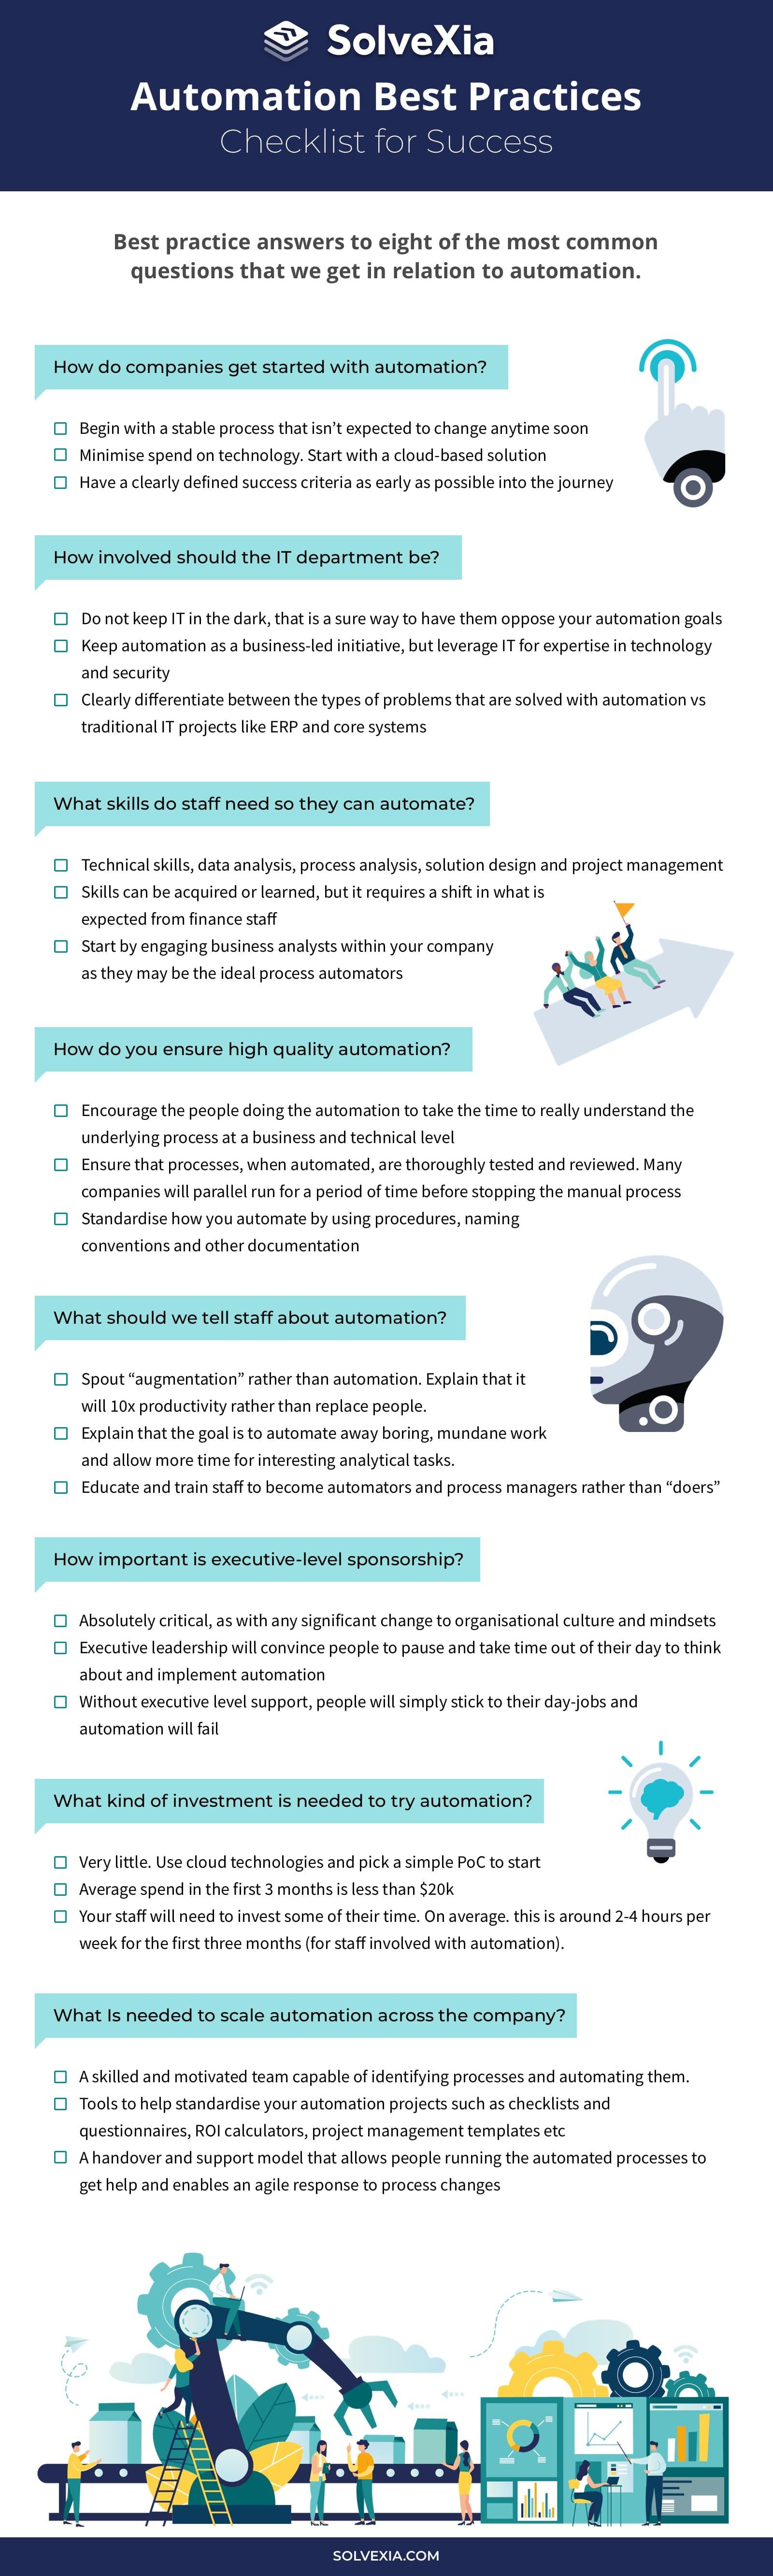 Automation best practices checklist